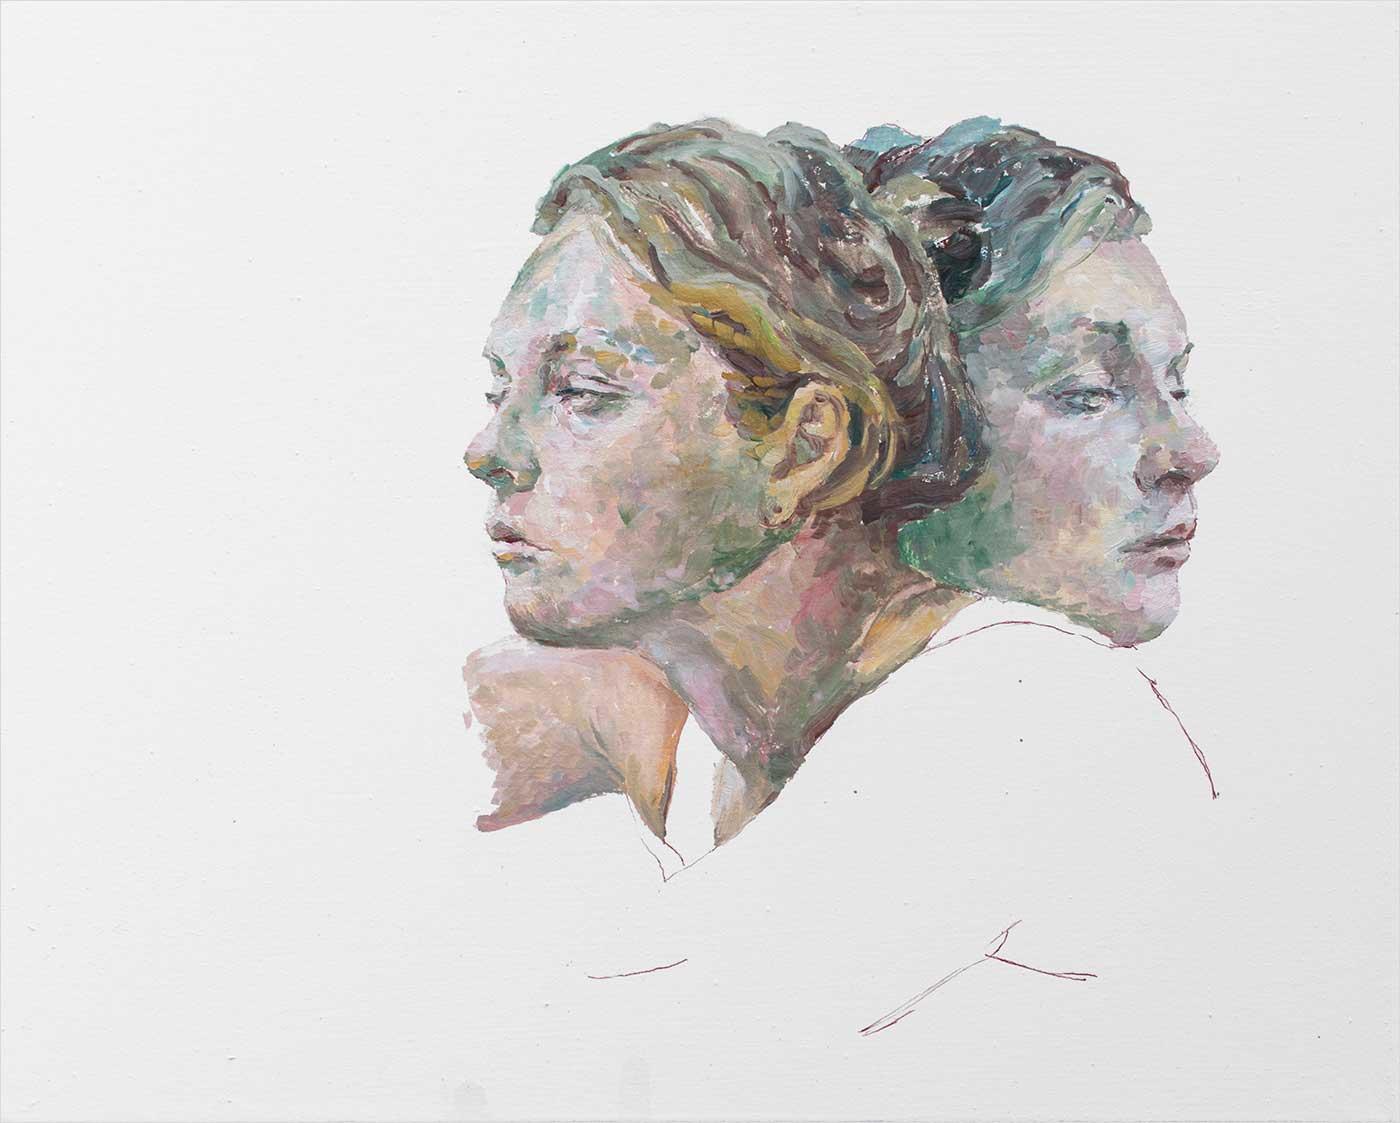 Janus 50 x 40 cm, Öl Lwd 2018